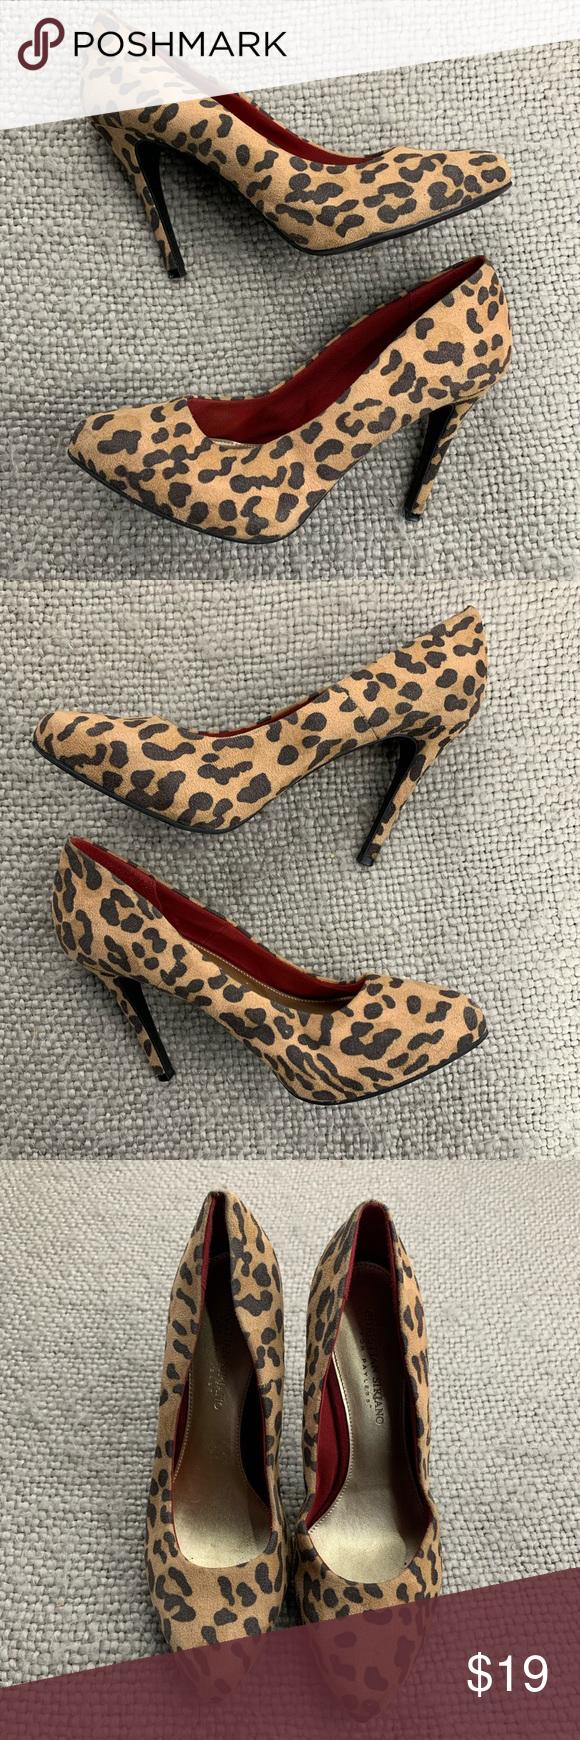 Payless Leopard Heels